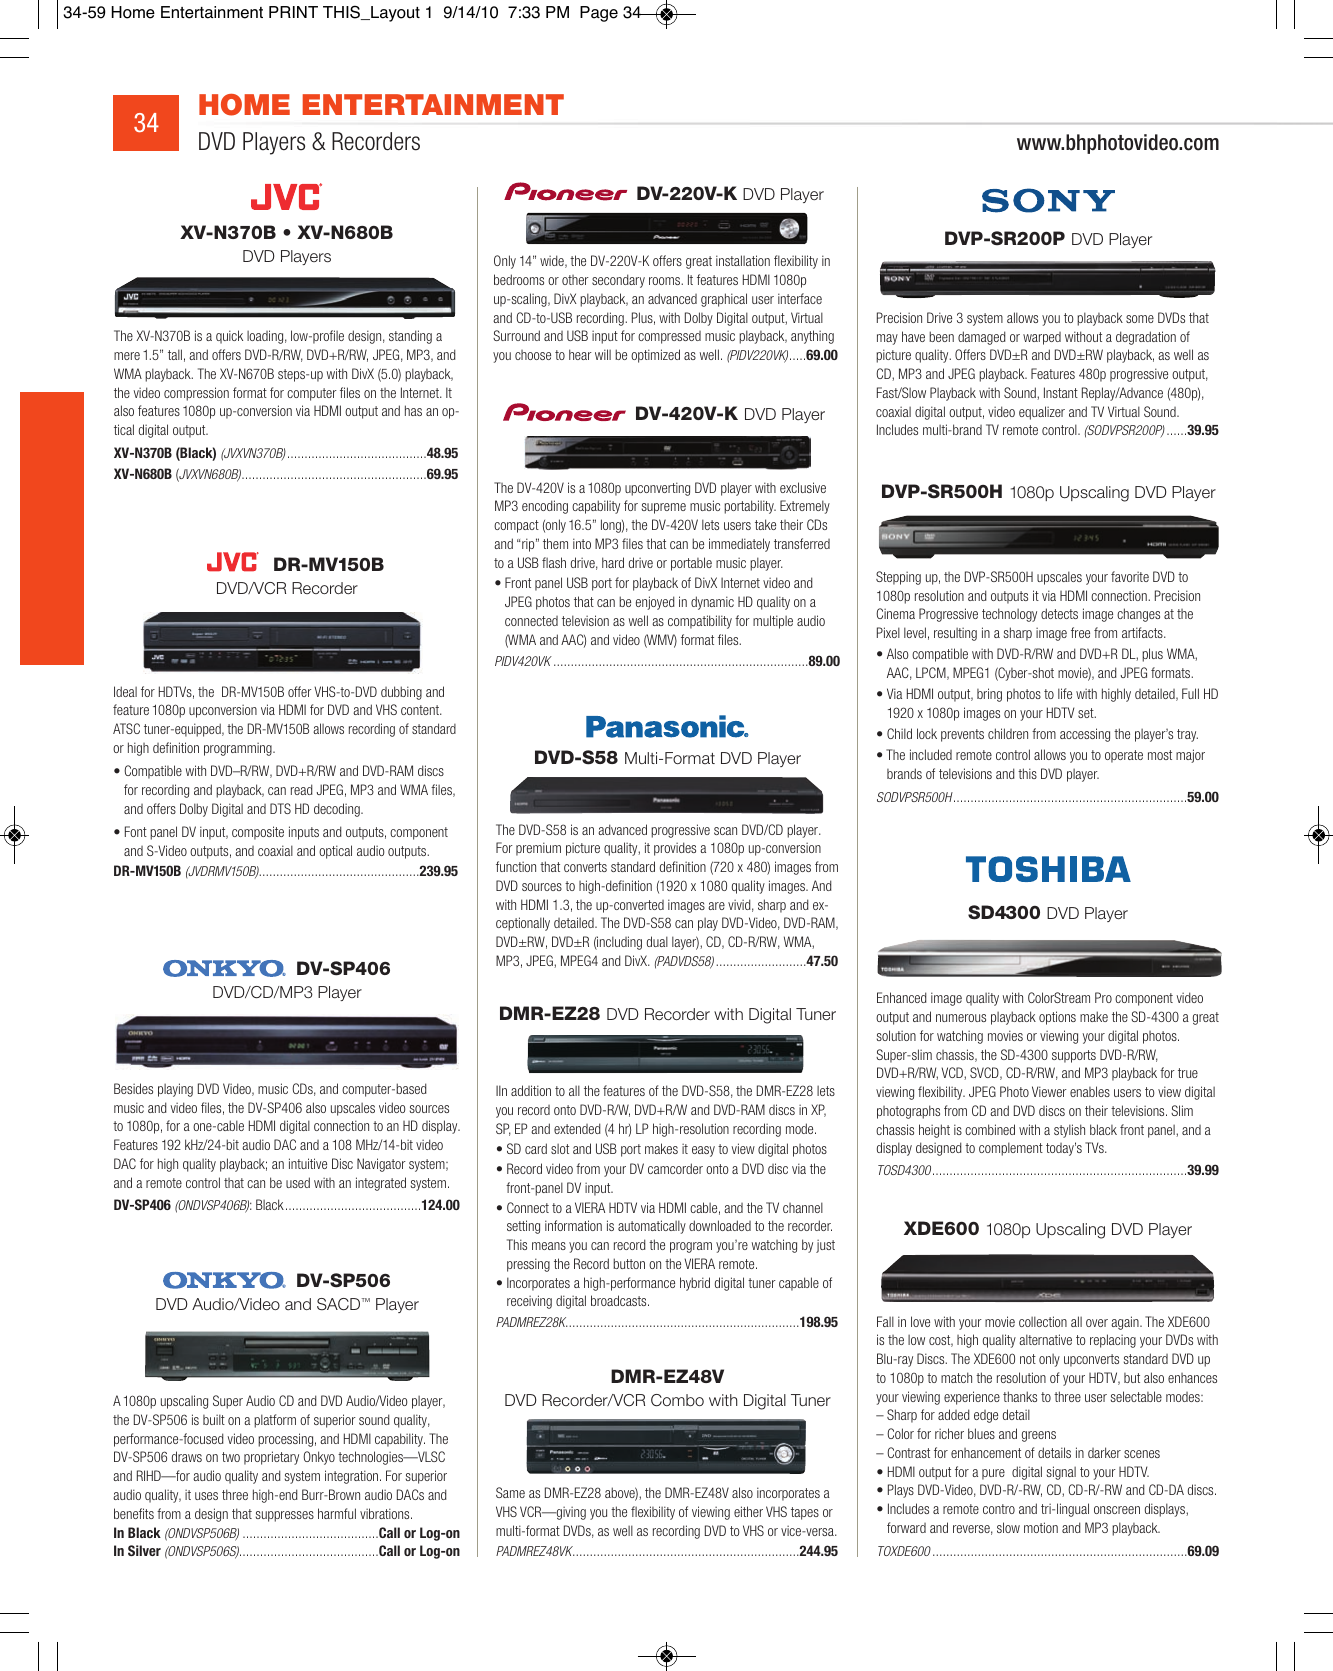 Jvc Dv Sp506 Users Manual Toshiba 22cv100u Wiring Diagram